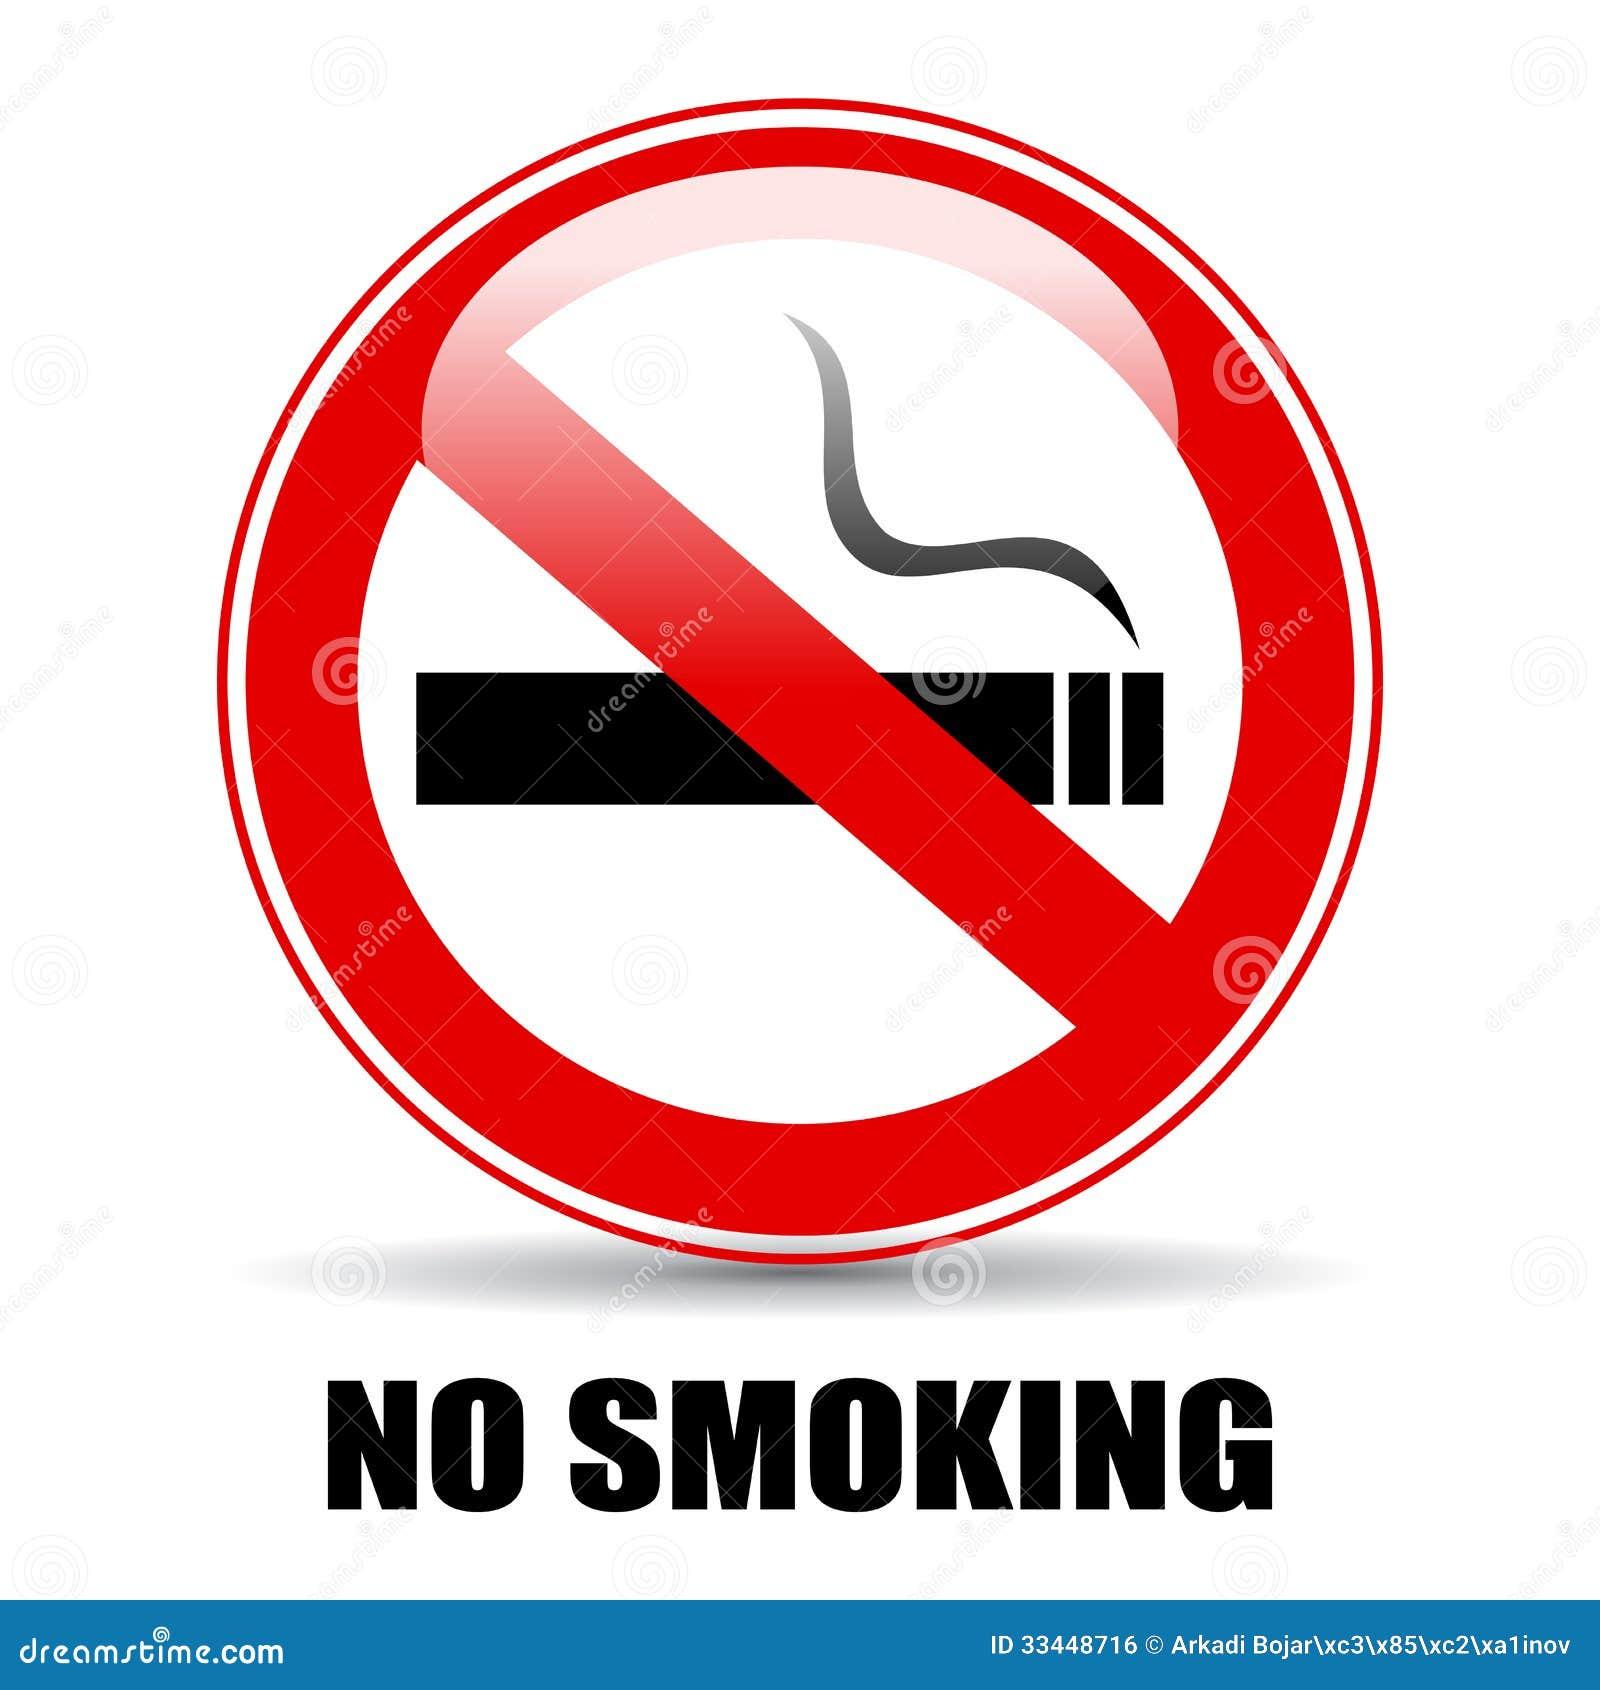 No smoking logo vector (. Eps) free download.